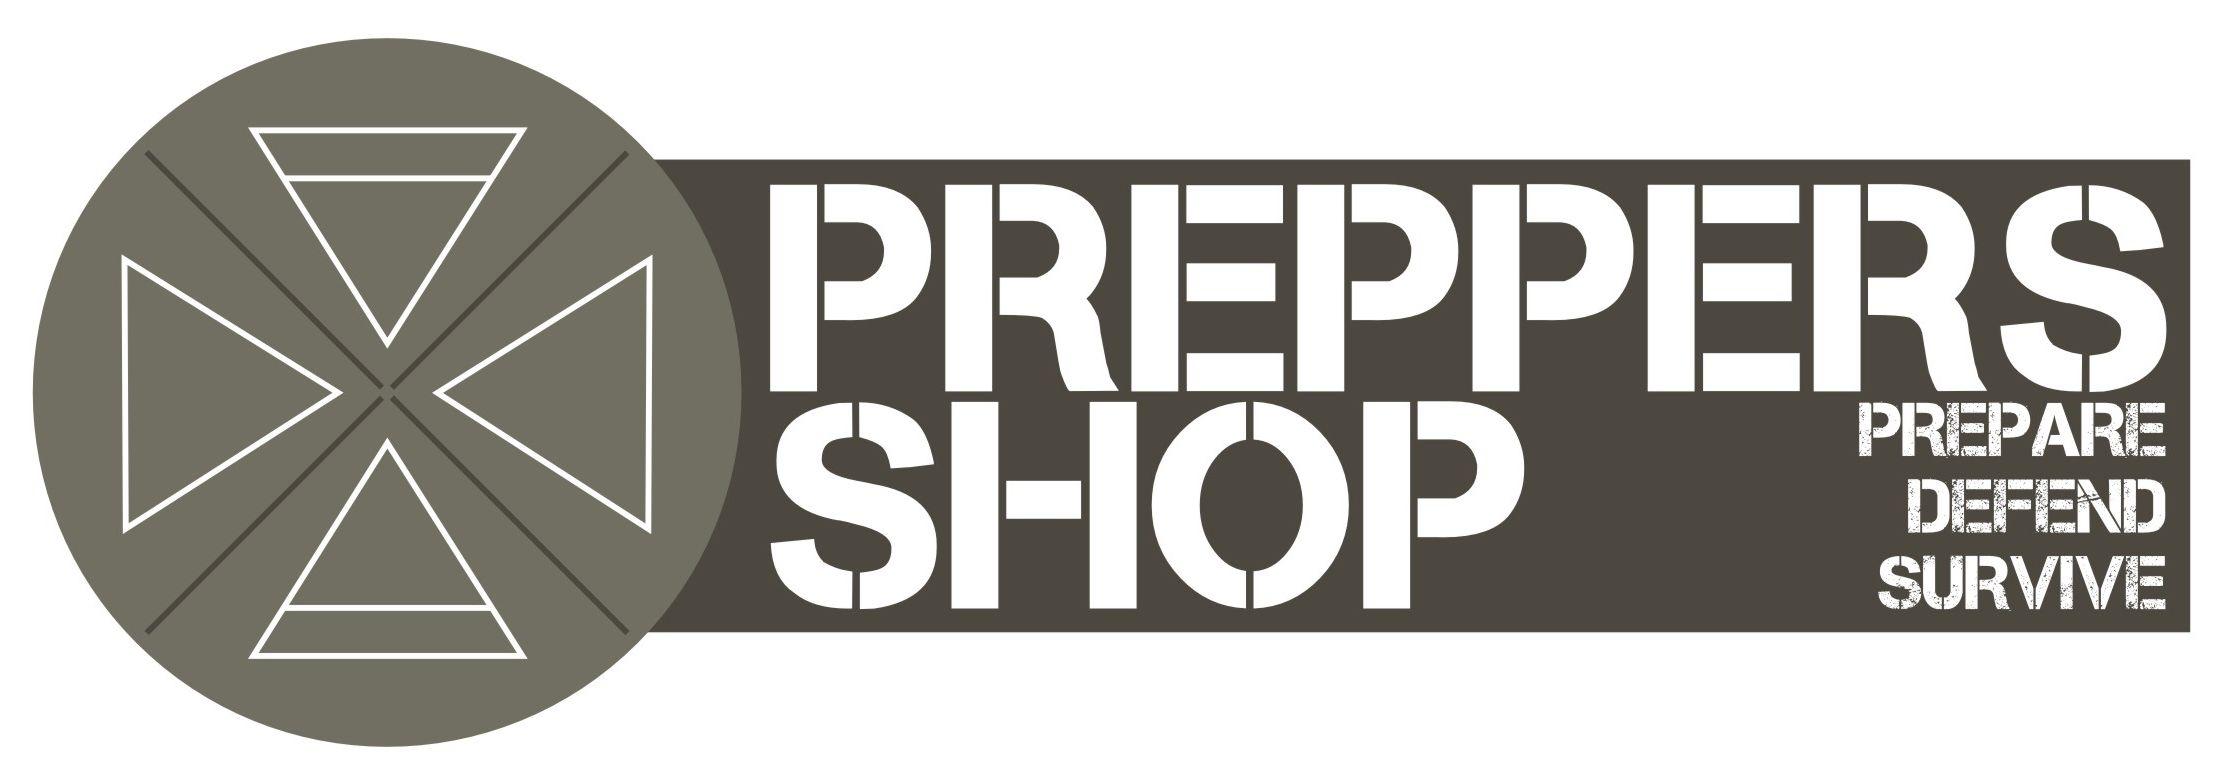 Preppers Shop Preppers Shop UK in the Media